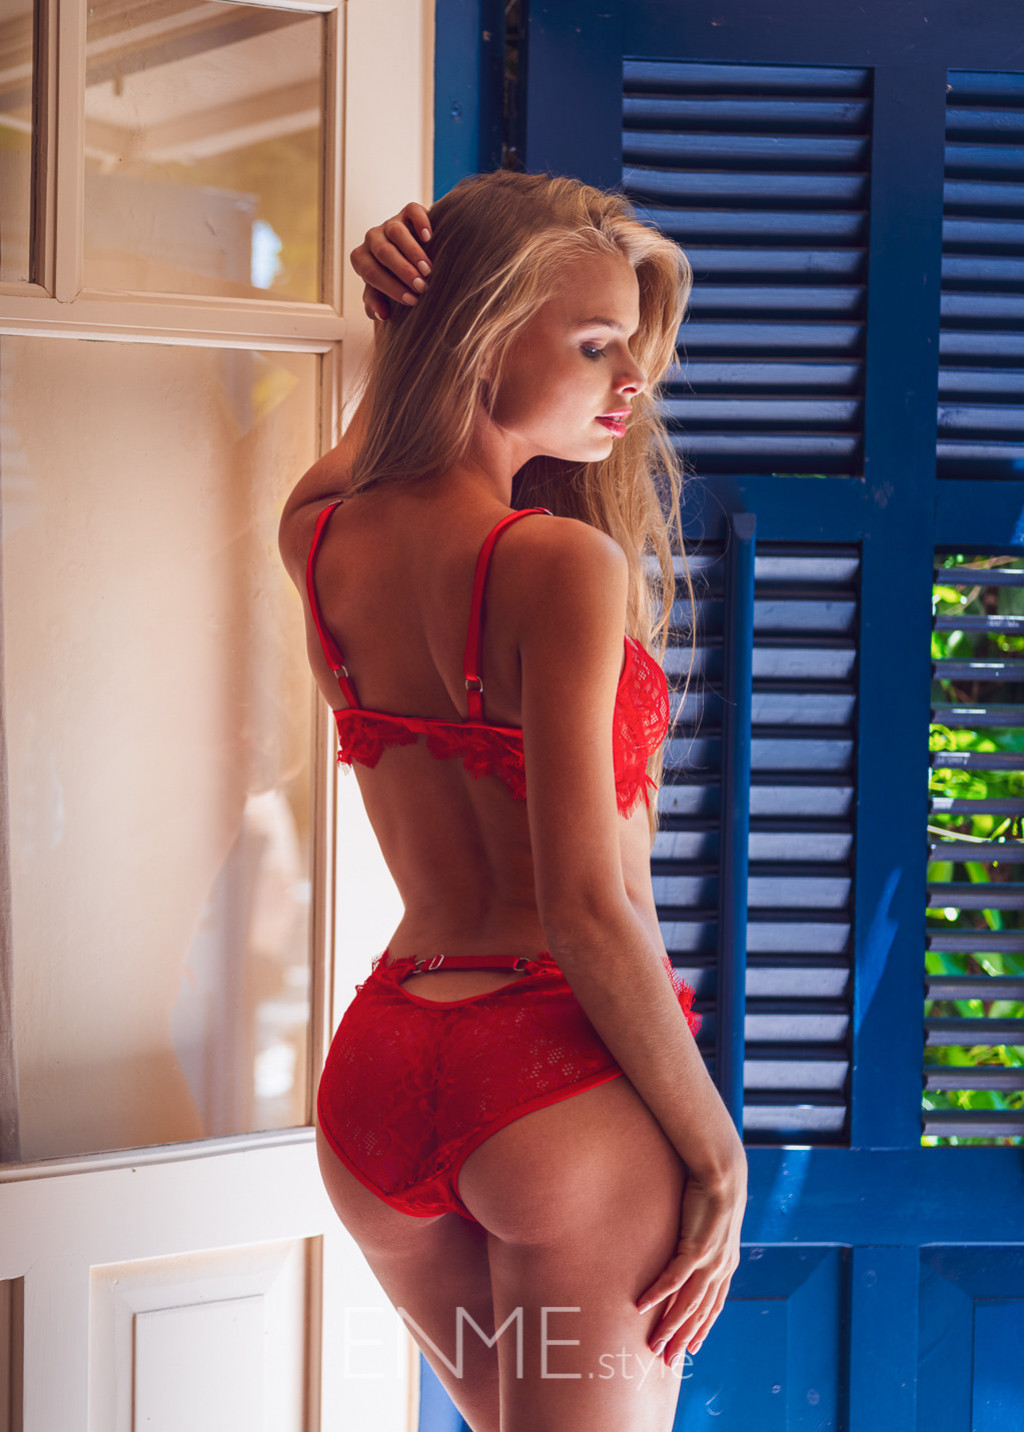 Red Balconette And Bikini In Lace